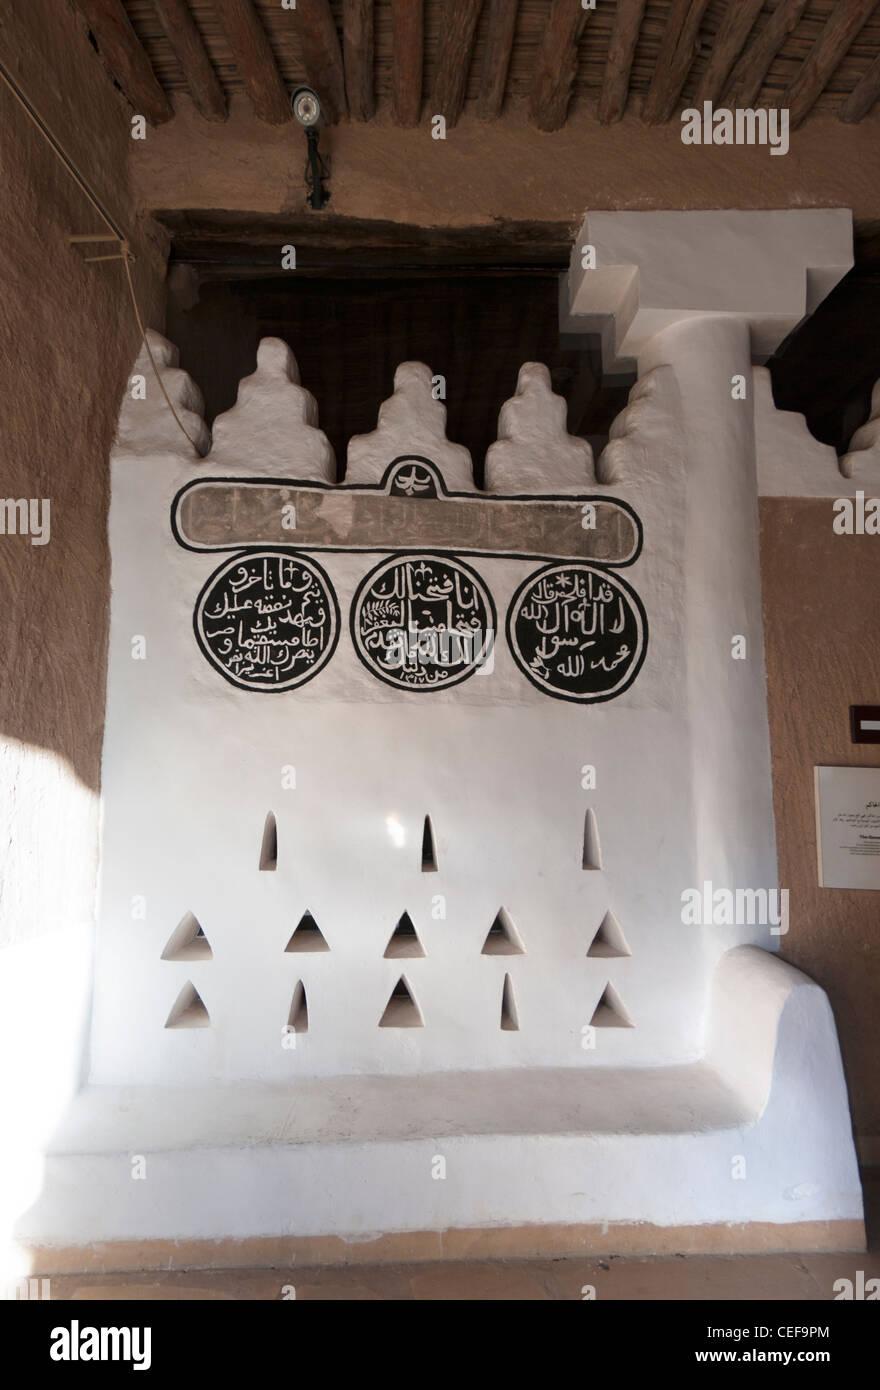 Inscripción árabe en detalle al Masmak Fort, Riyadh, Arabia Saudita Imagen De Stock